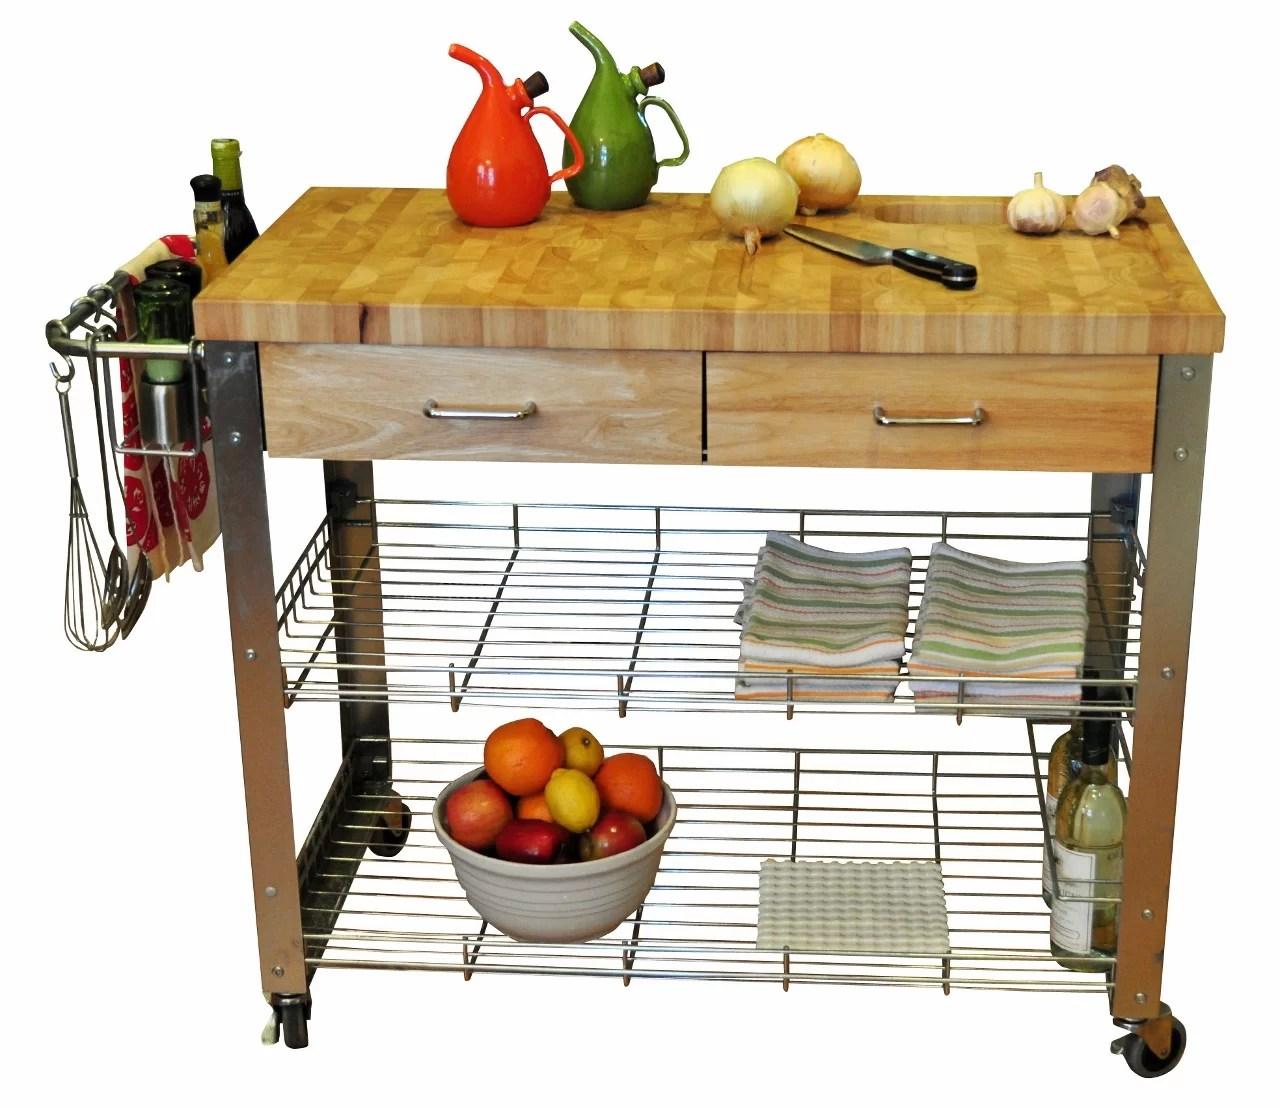 wooden kitchen cart ninja mega system bl770 reviews thielsen with wood top joss main